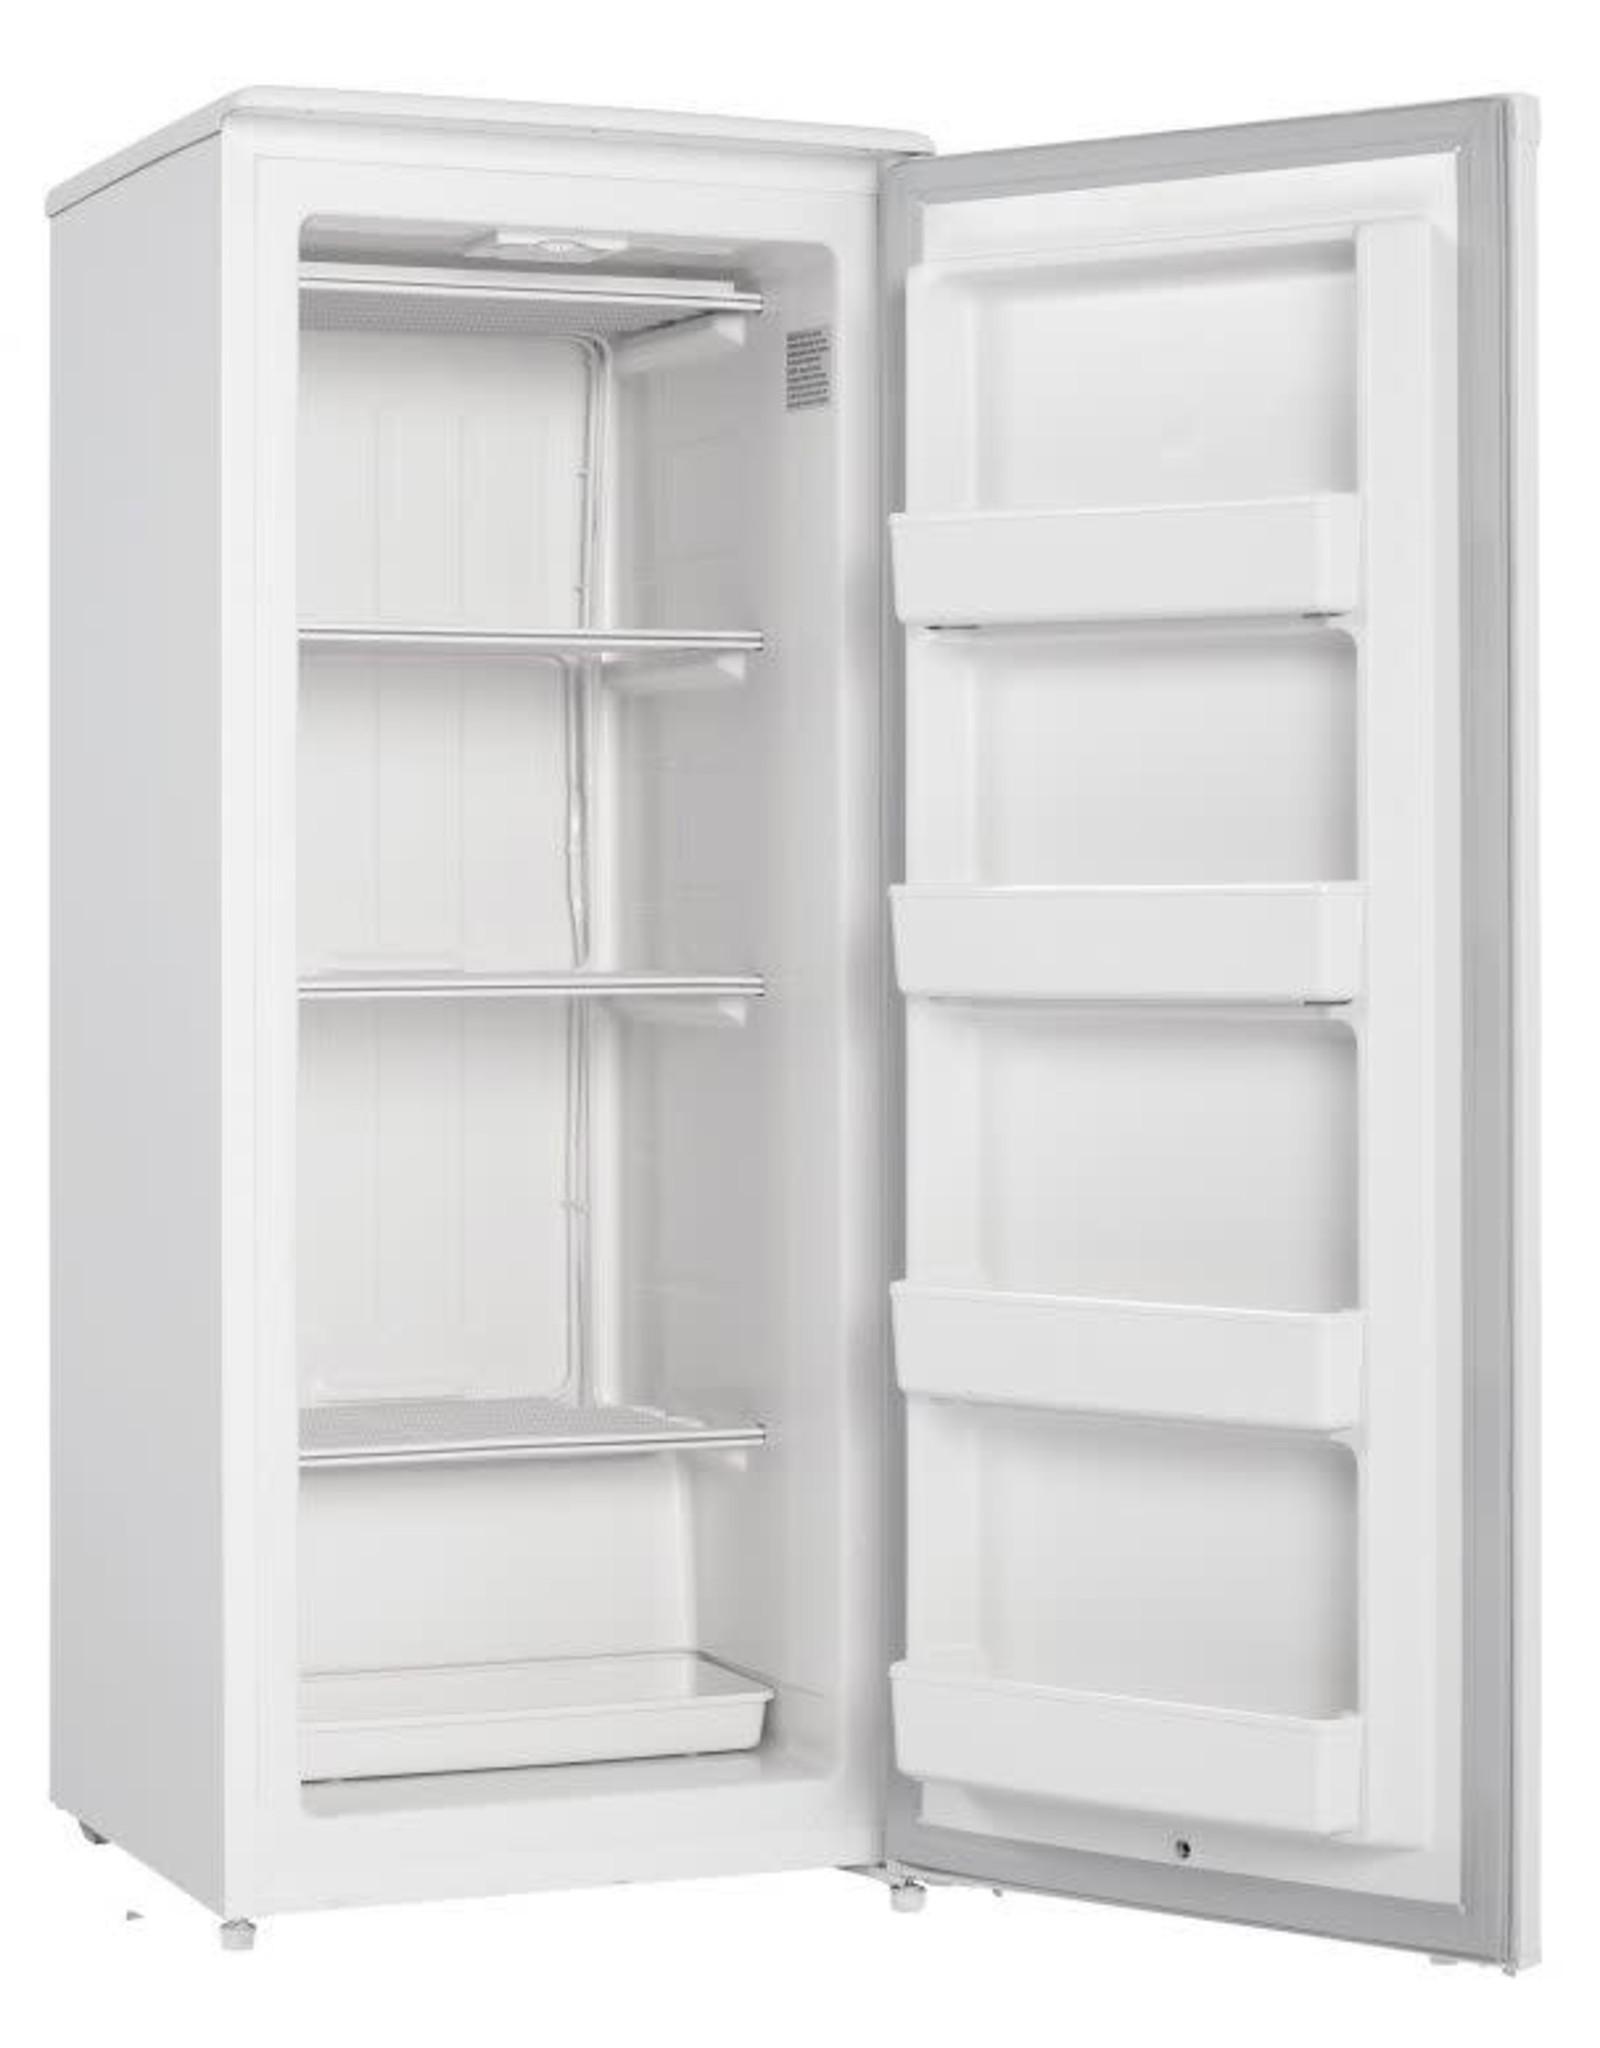 DANBY DUFM085A4WDD 8.5 cu. ft. Manual Defrost Upright Freezer in White